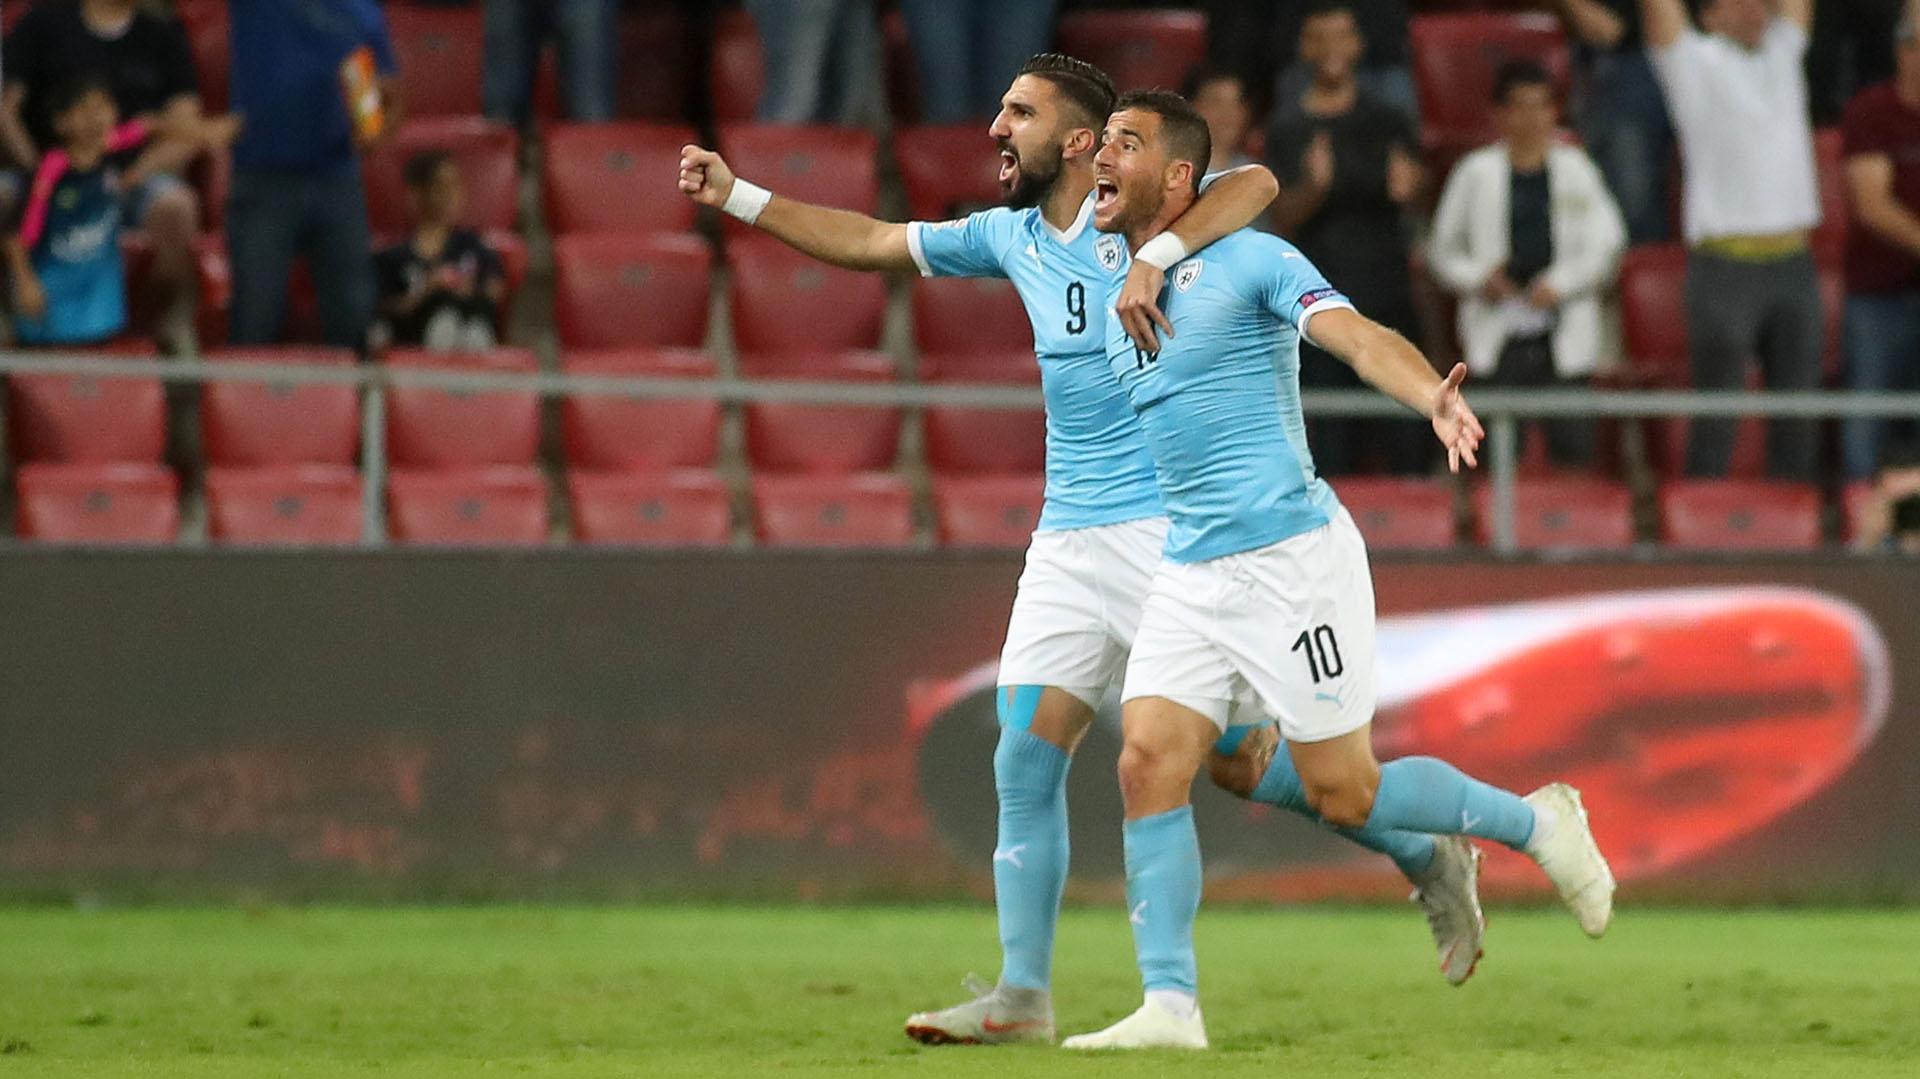 Dabour junto a Tomer Hemed, celebrando un gol en la selección israelí (Grosby)